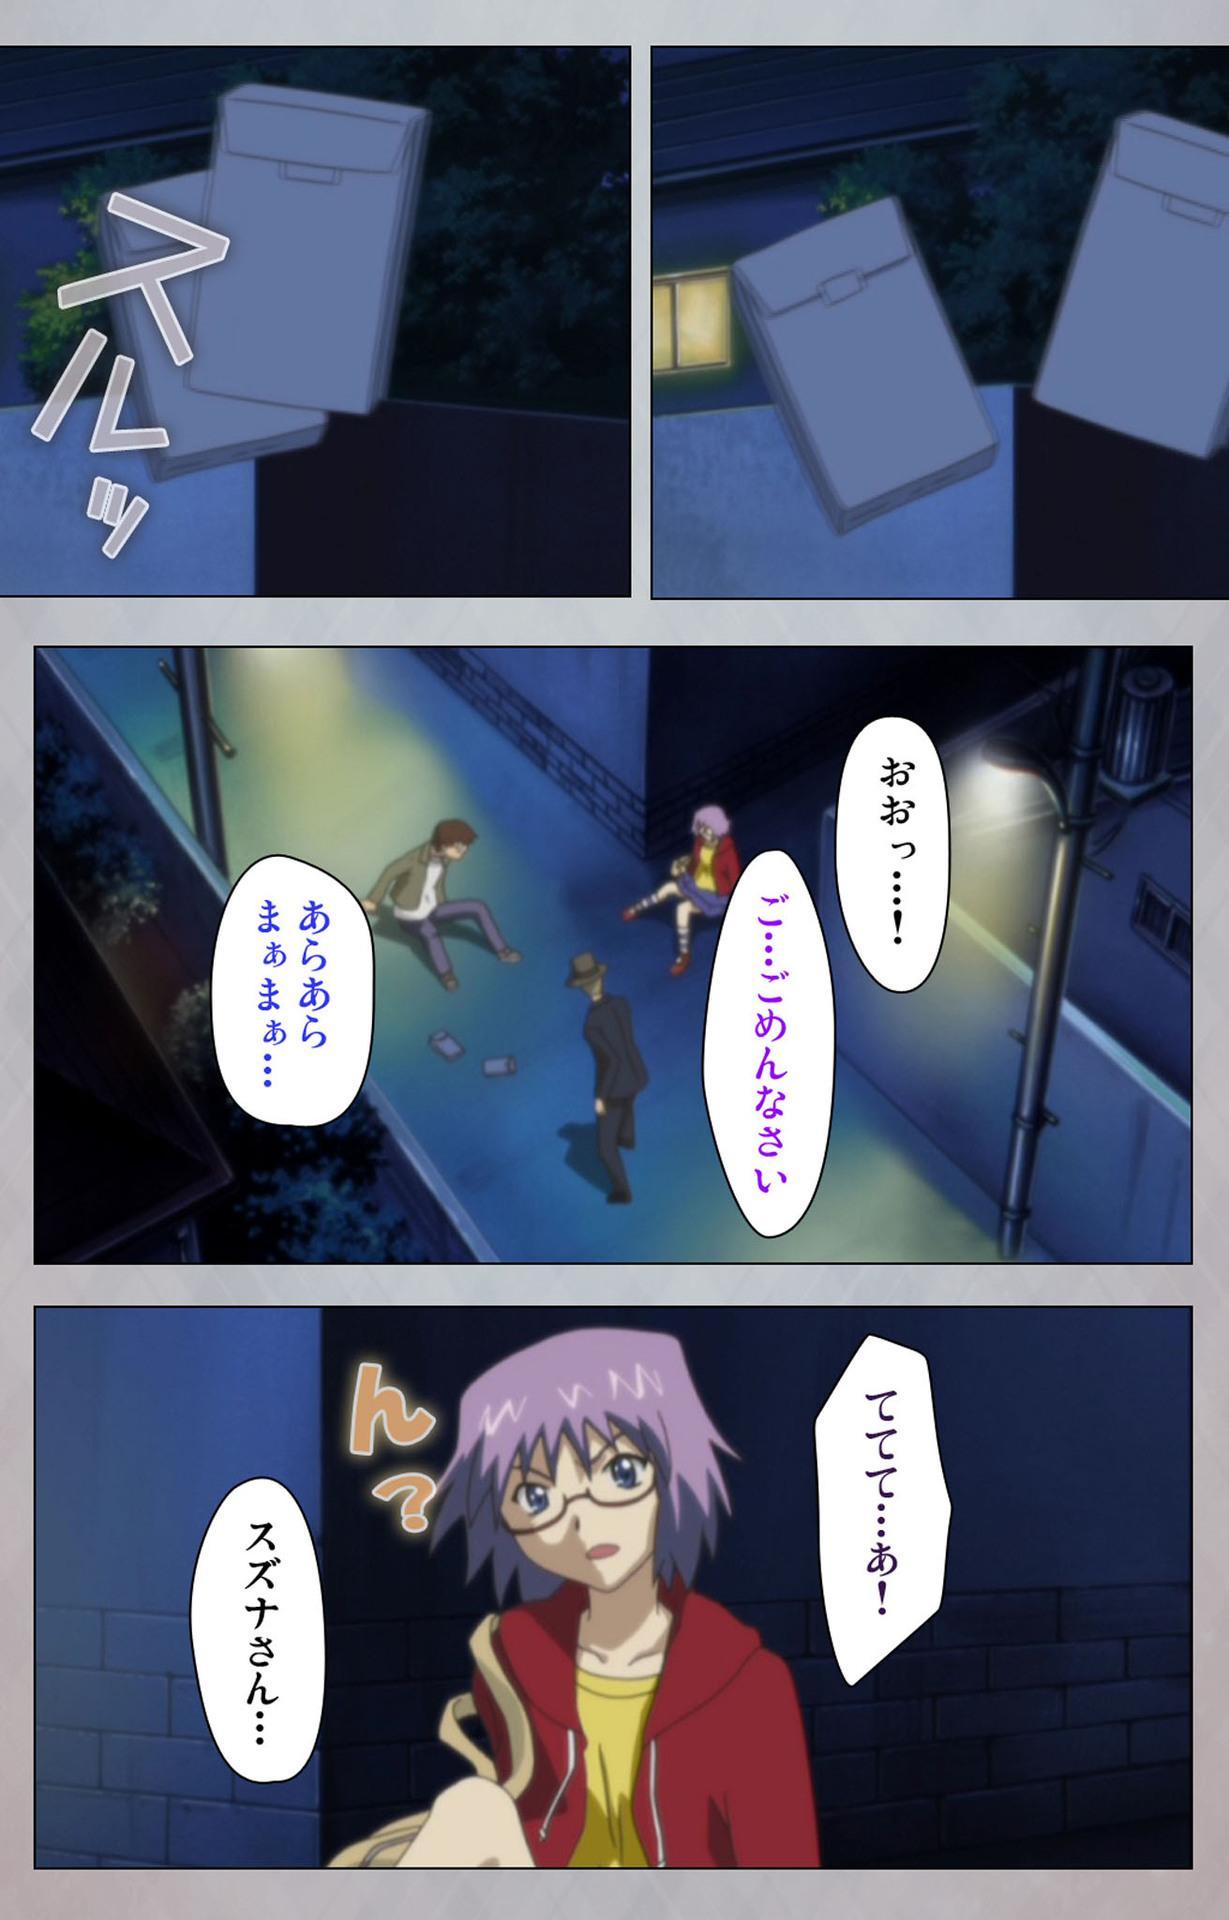 [Digital Works] [Full Color Seijin Ban] Sex Android ~Risou no Onna de Nuite yaru~ Kanzenban 19